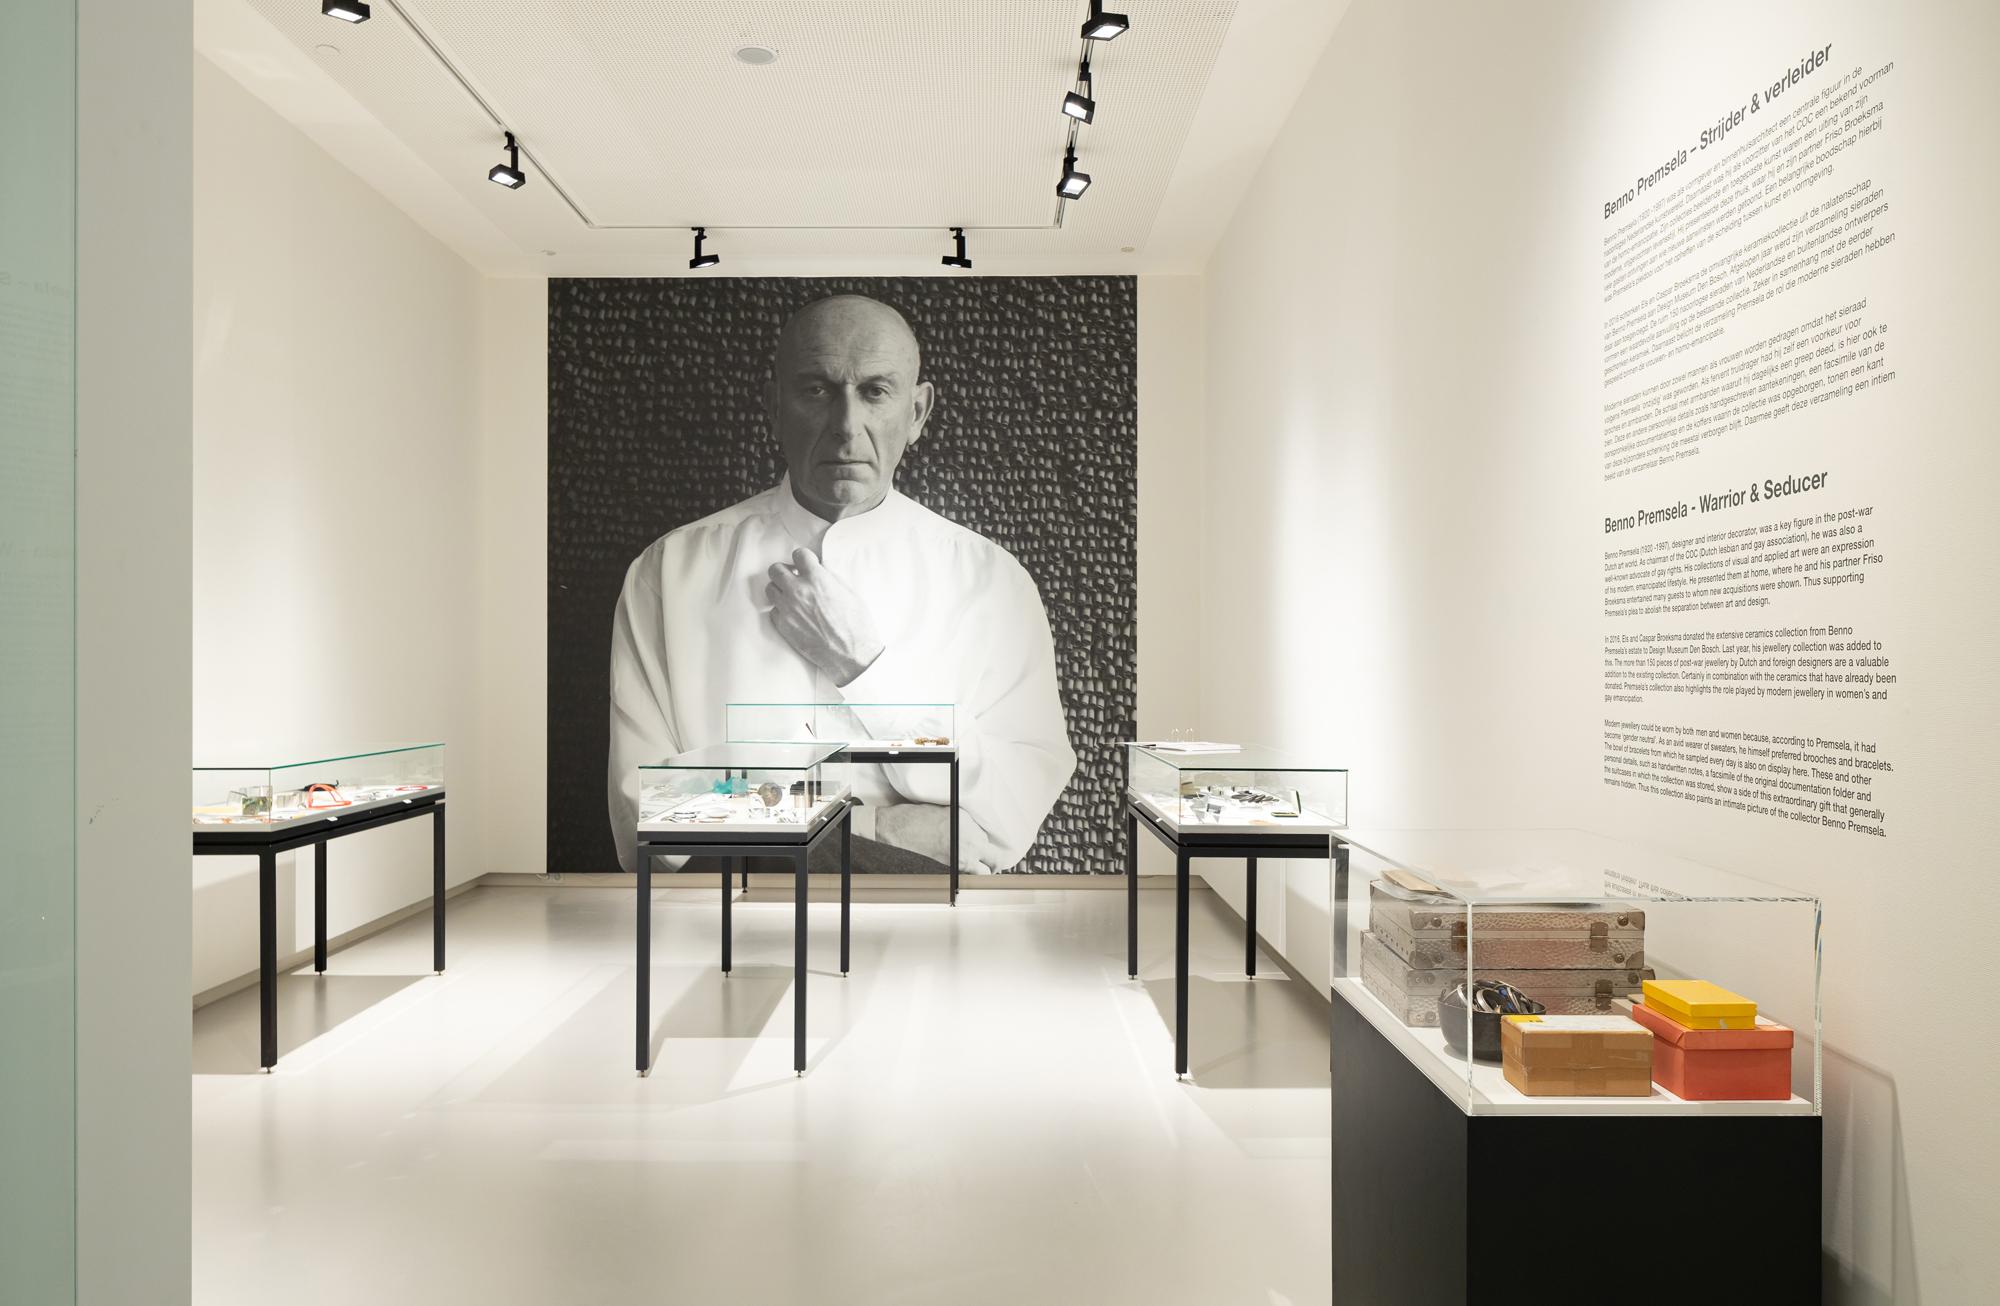 Benno Premsela - Strijder en verleider, Design Museum Den Bosch, 2021, tentoonstelling, portret, verpakking